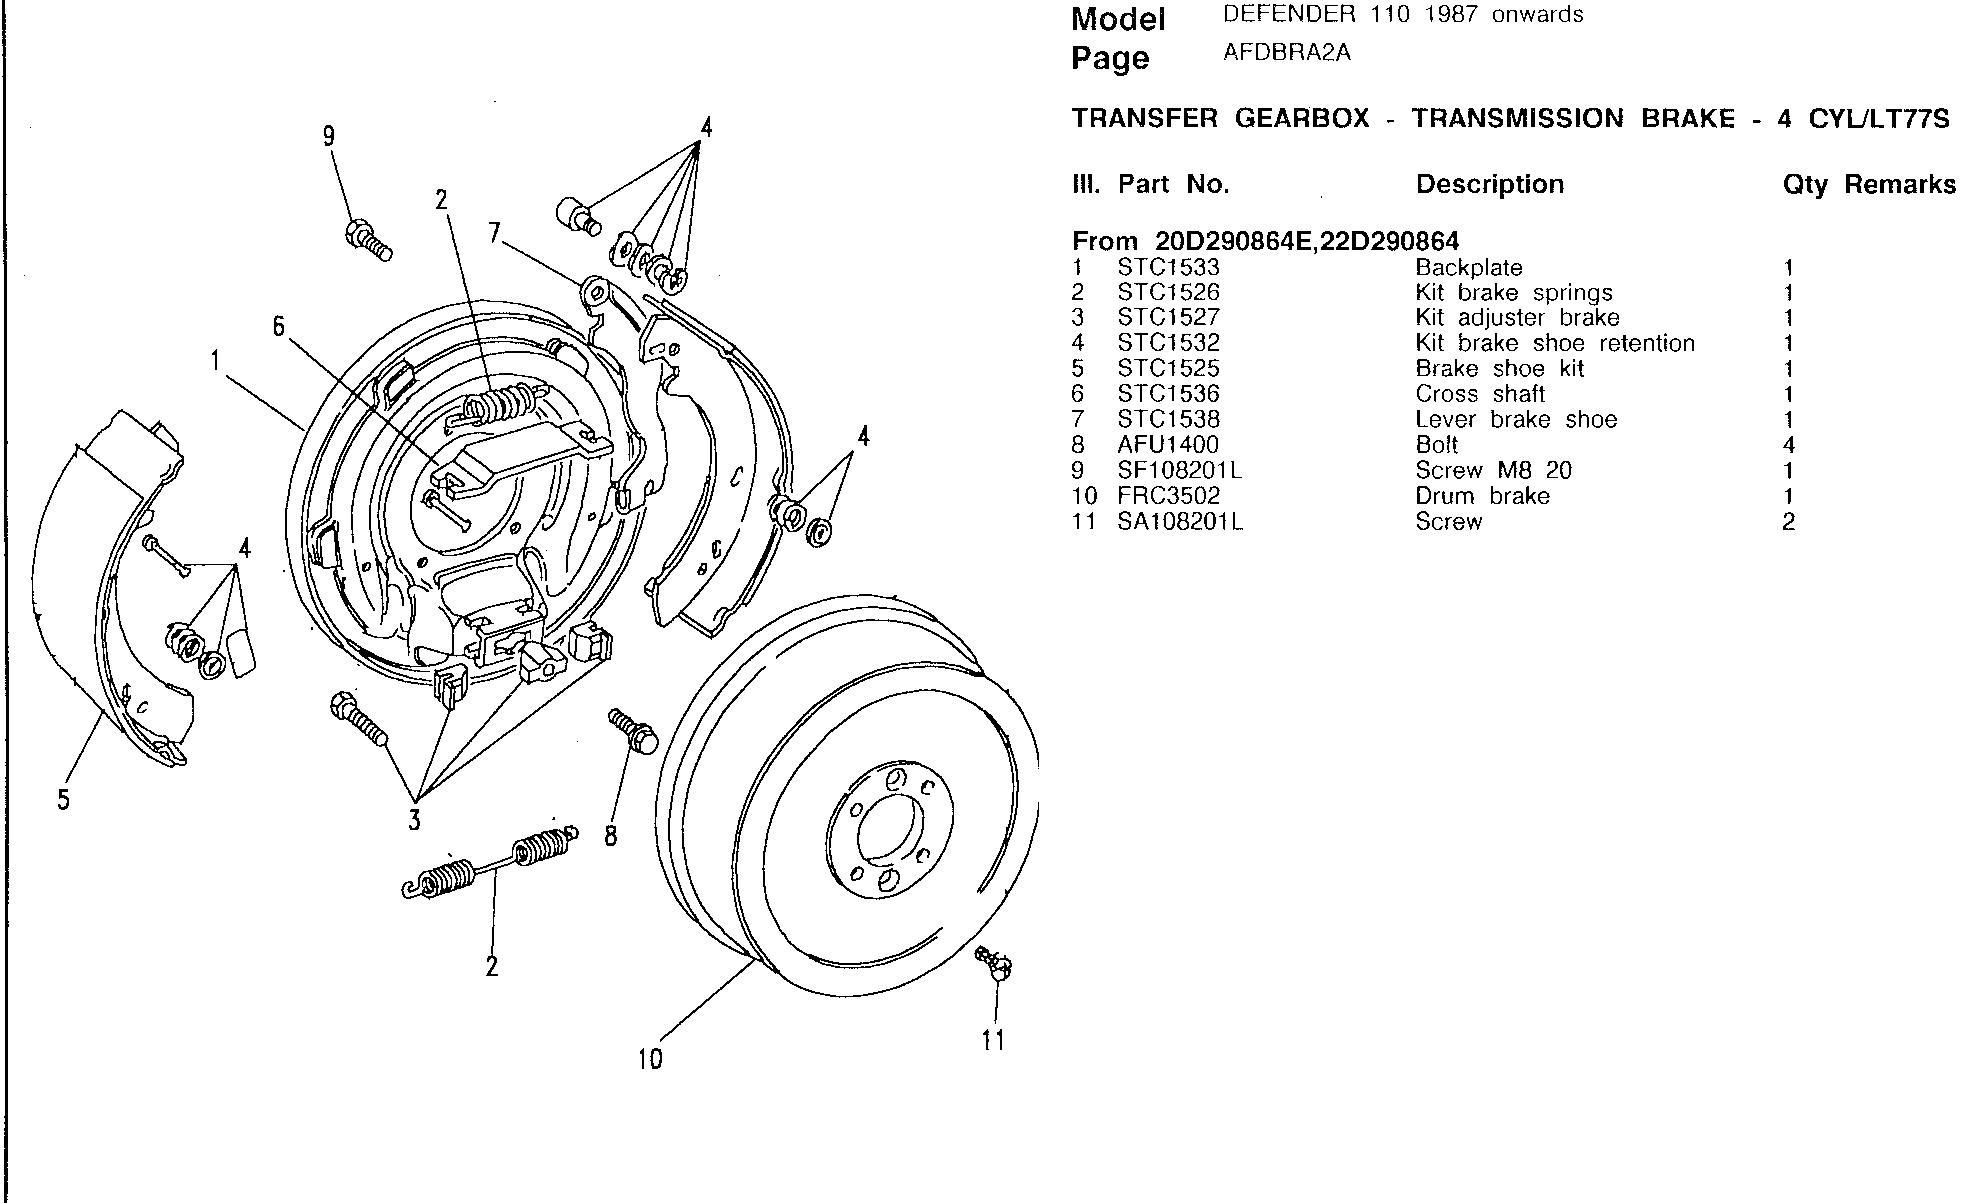 Transmission Brake Assembly